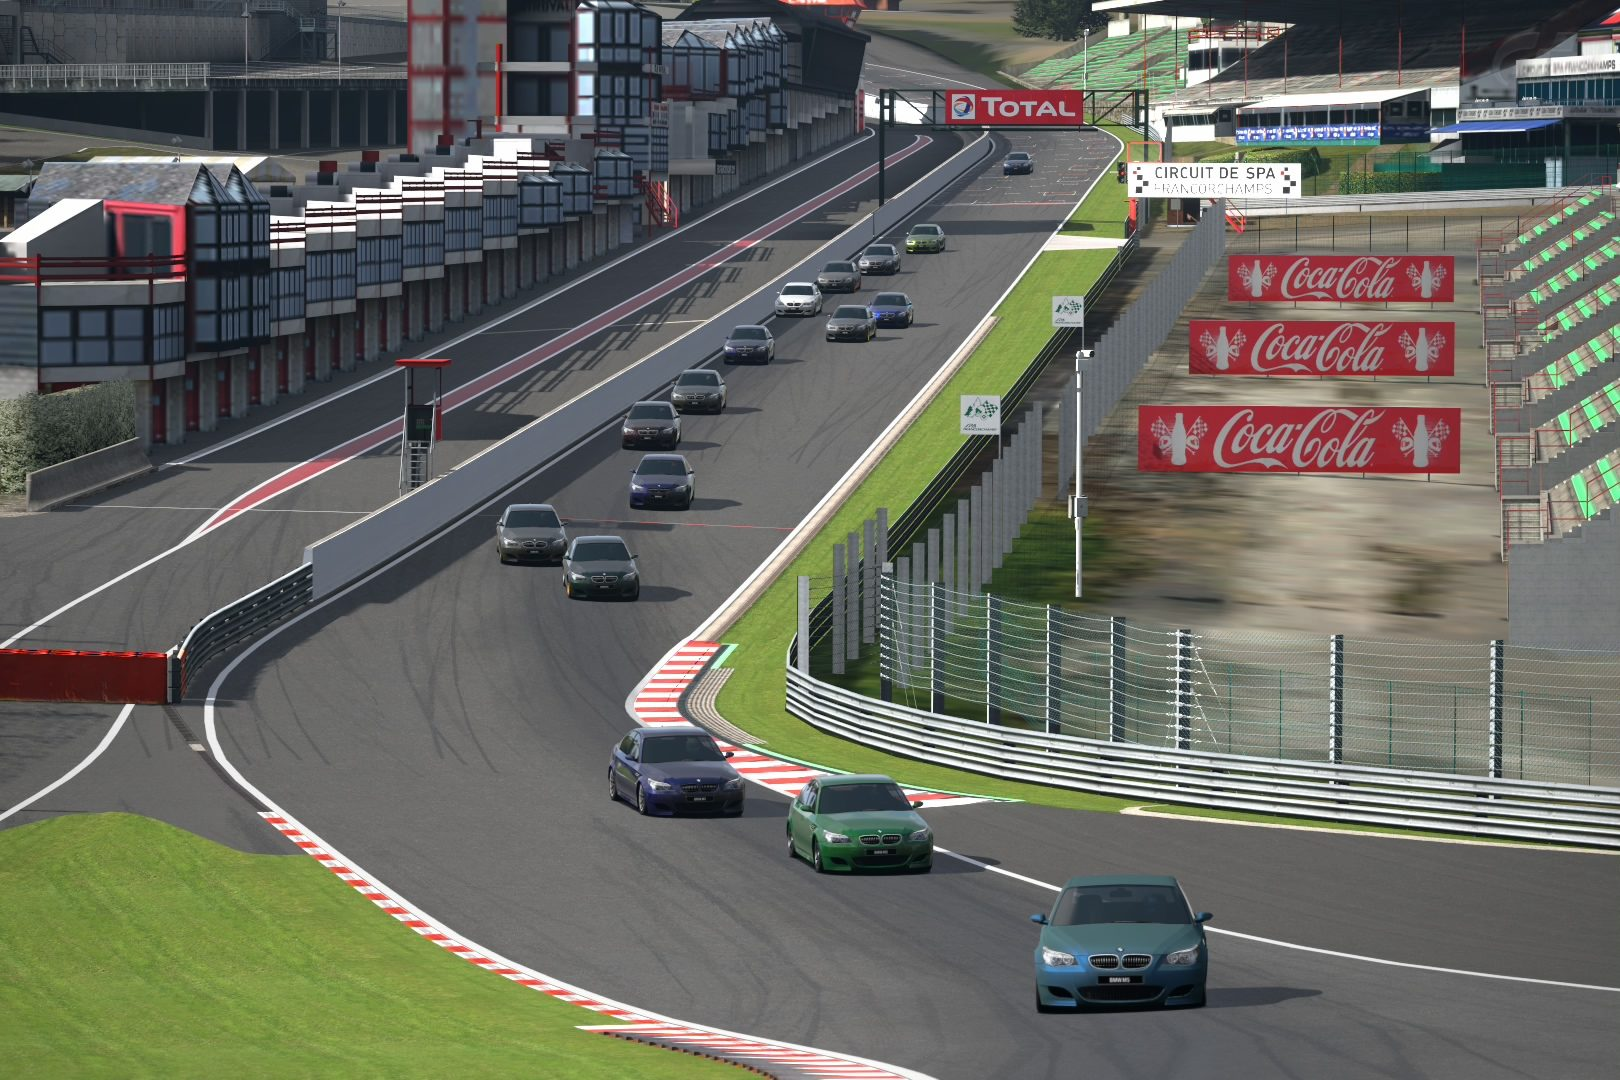 Circuit de Spa-Francorchamps_12.jpg